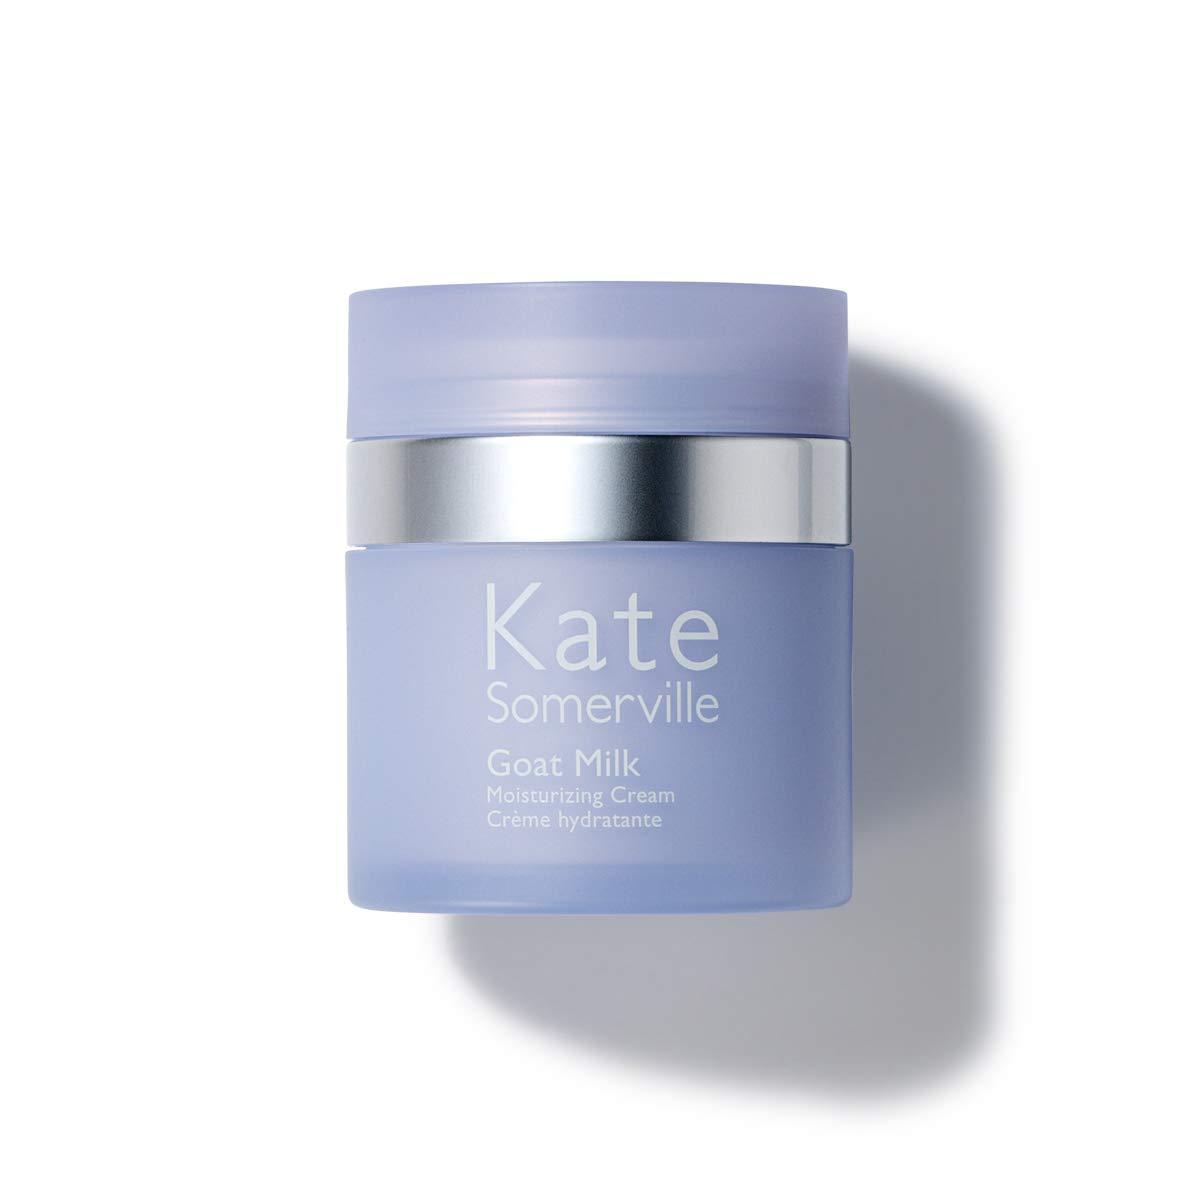 Kate Somerville Goat Milk Cream-1.7 oz.